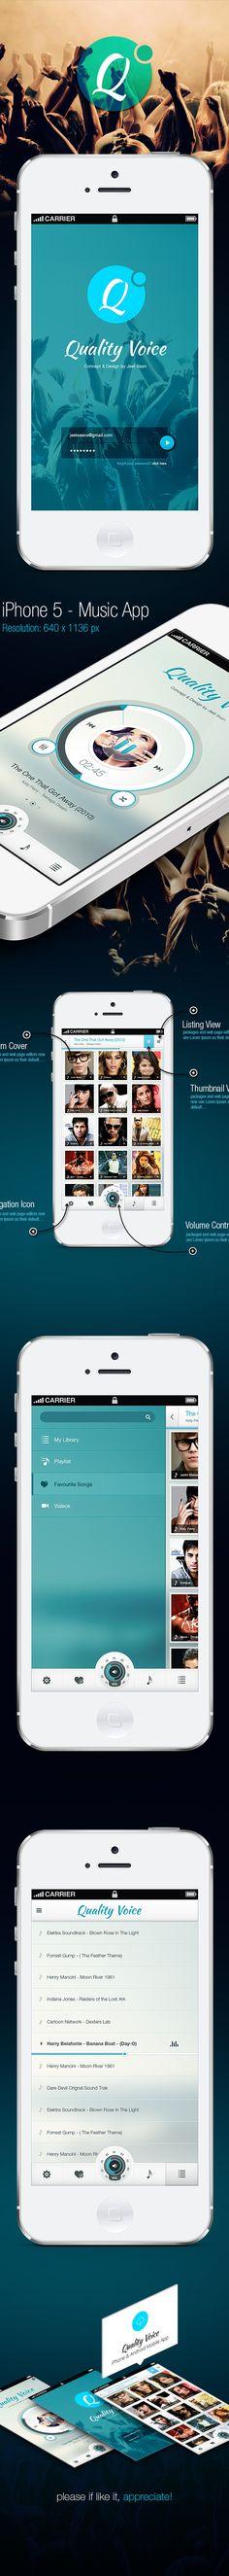 Quality Voice – Mobile App UI